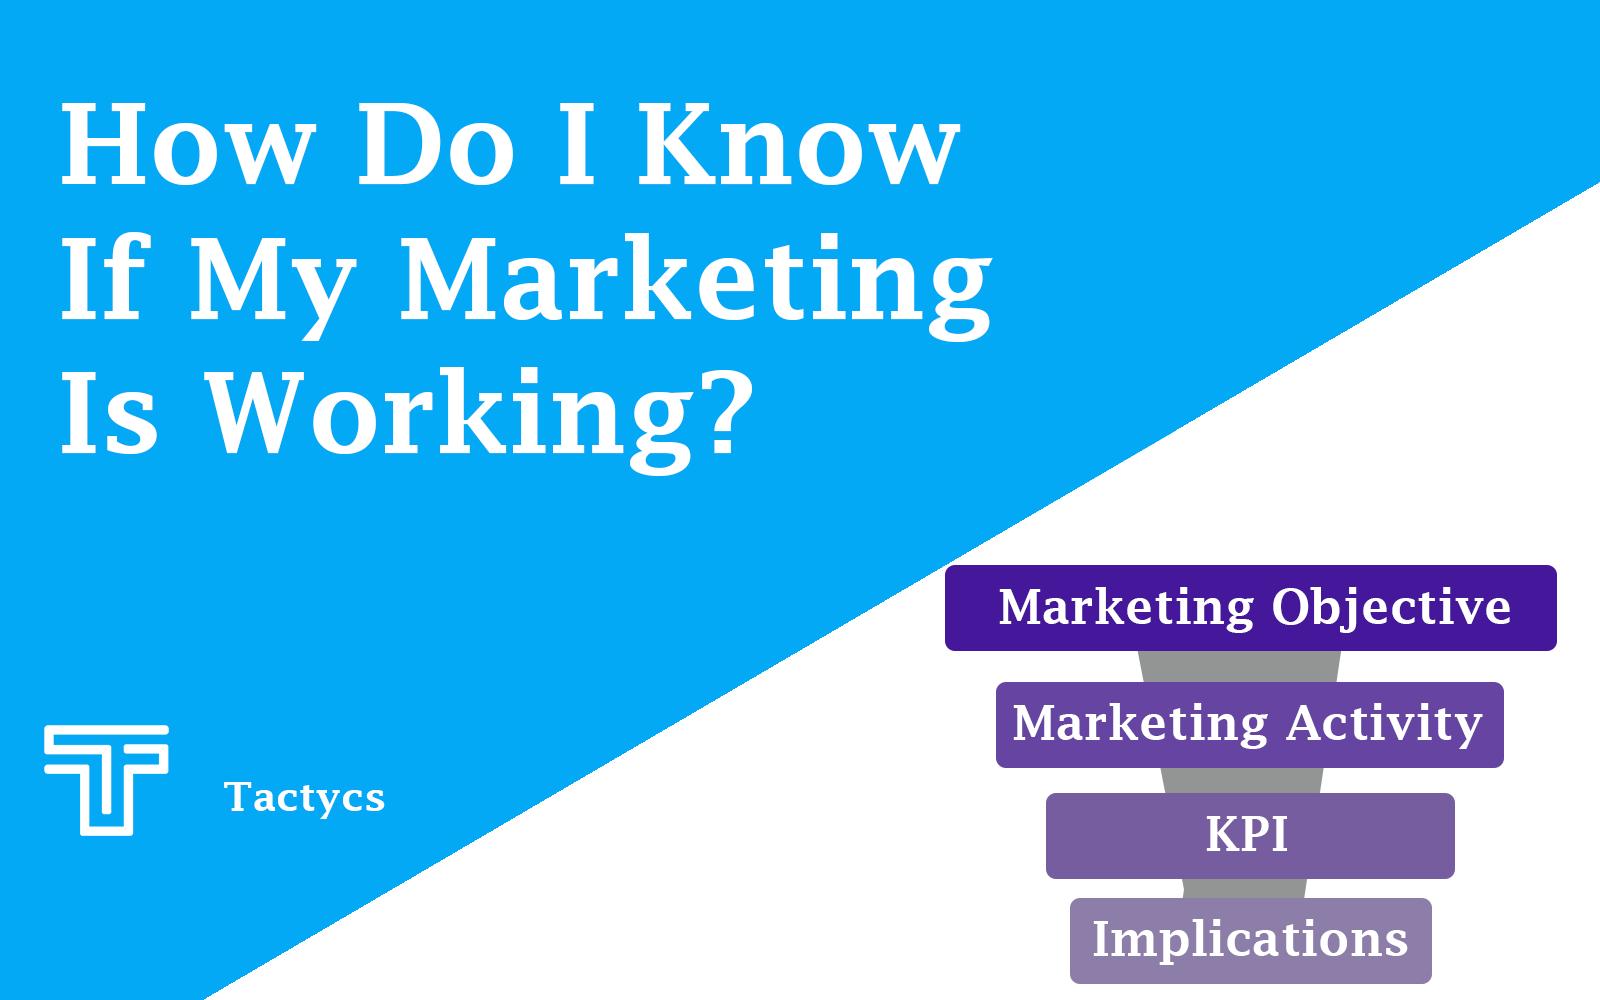 how do I know if my marketing is working